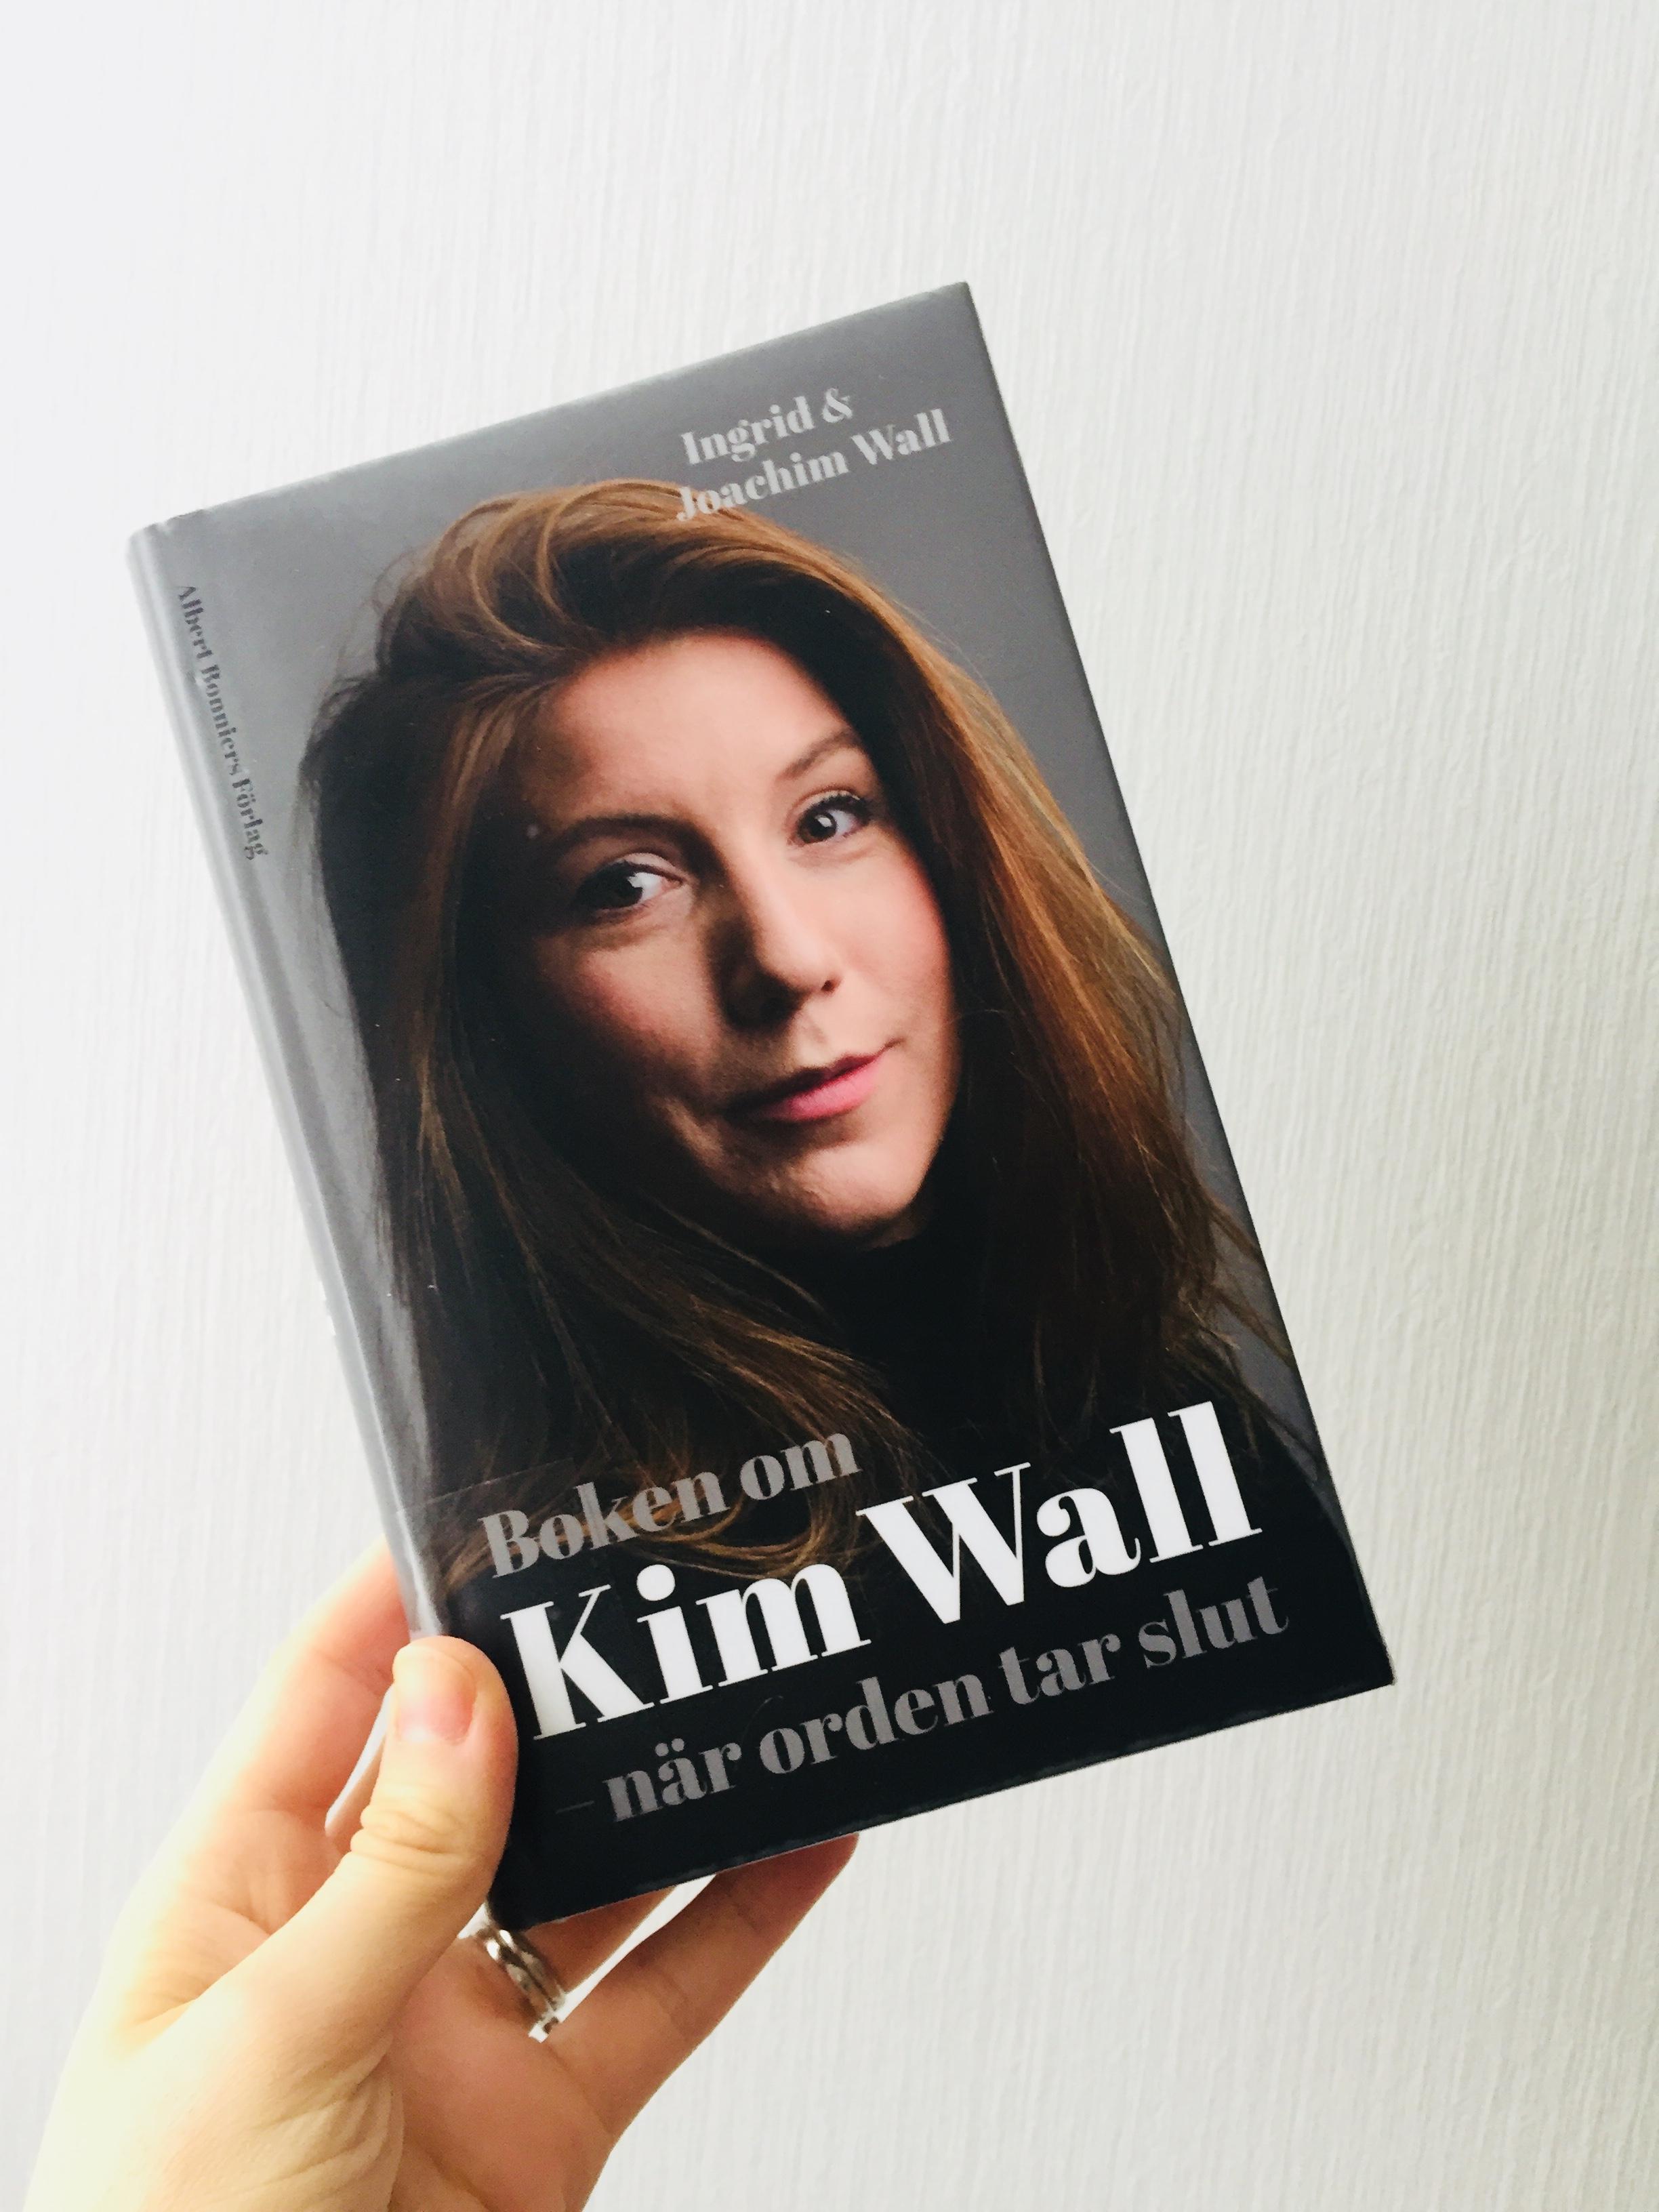 Boken om Kim Wall.jpg